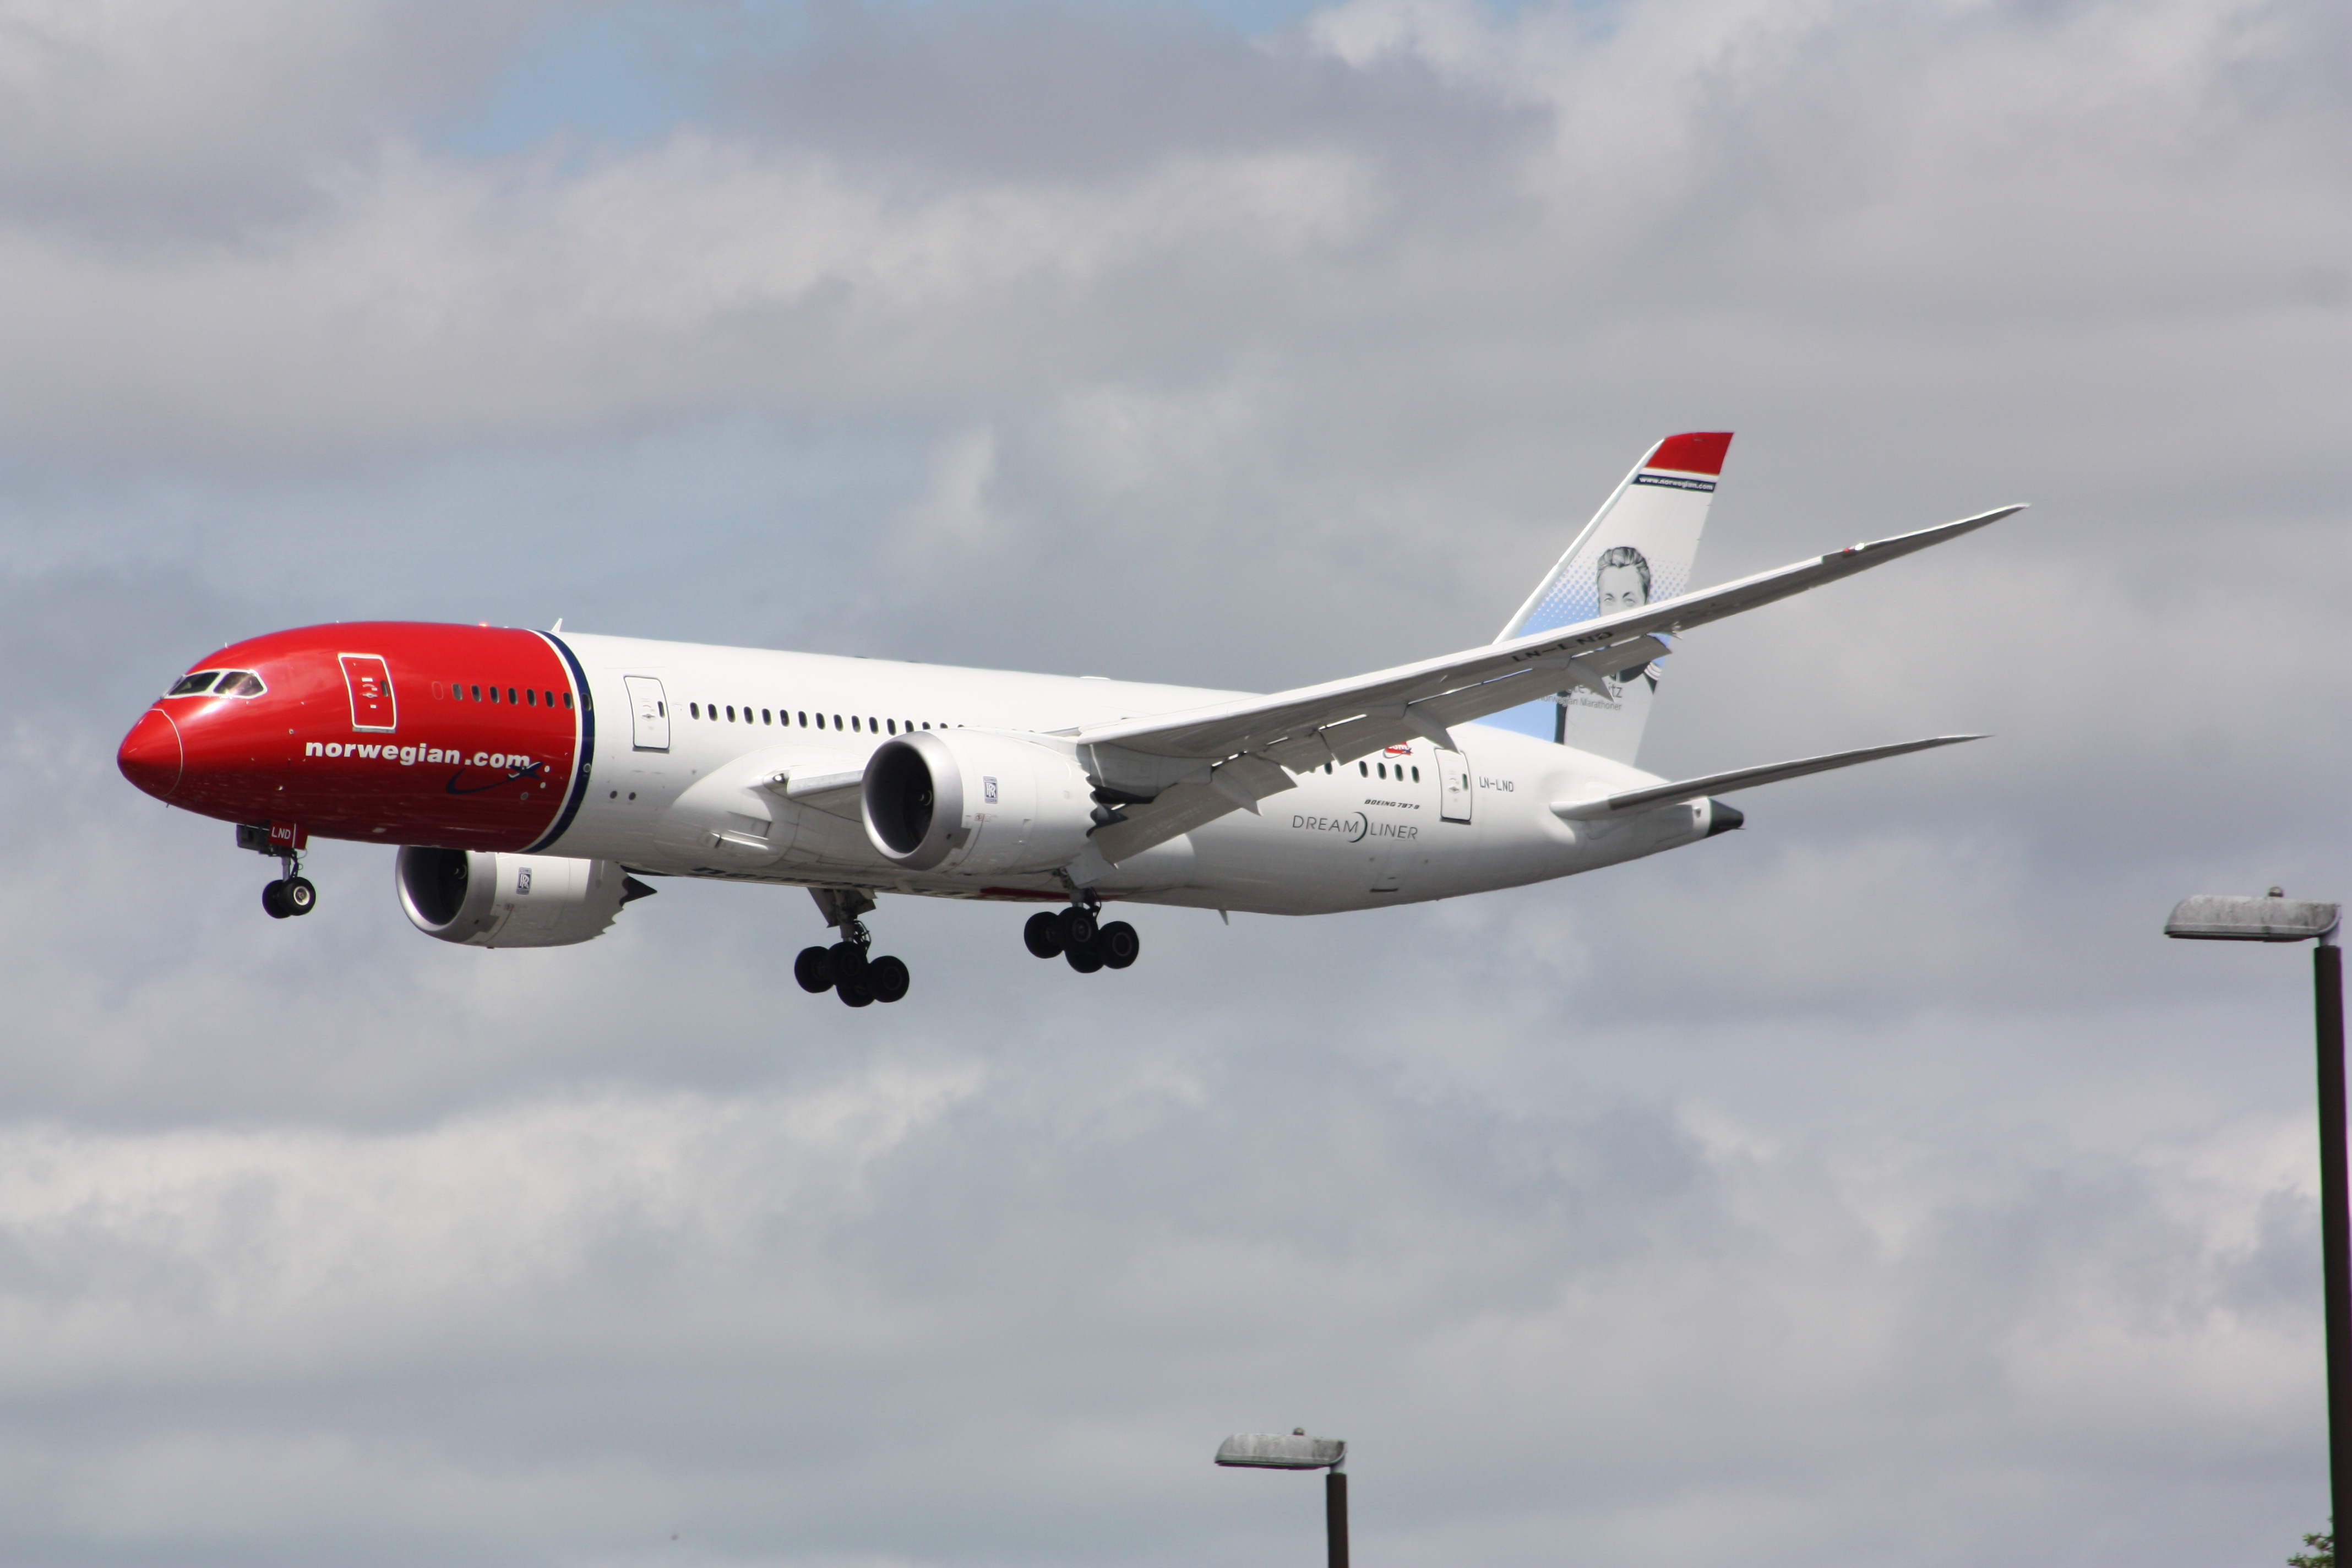 norwegian lanserar nya linjer fr n tyskland flyg24nyheter. Black Bedroom Furniture Sets. Home Design Ideas